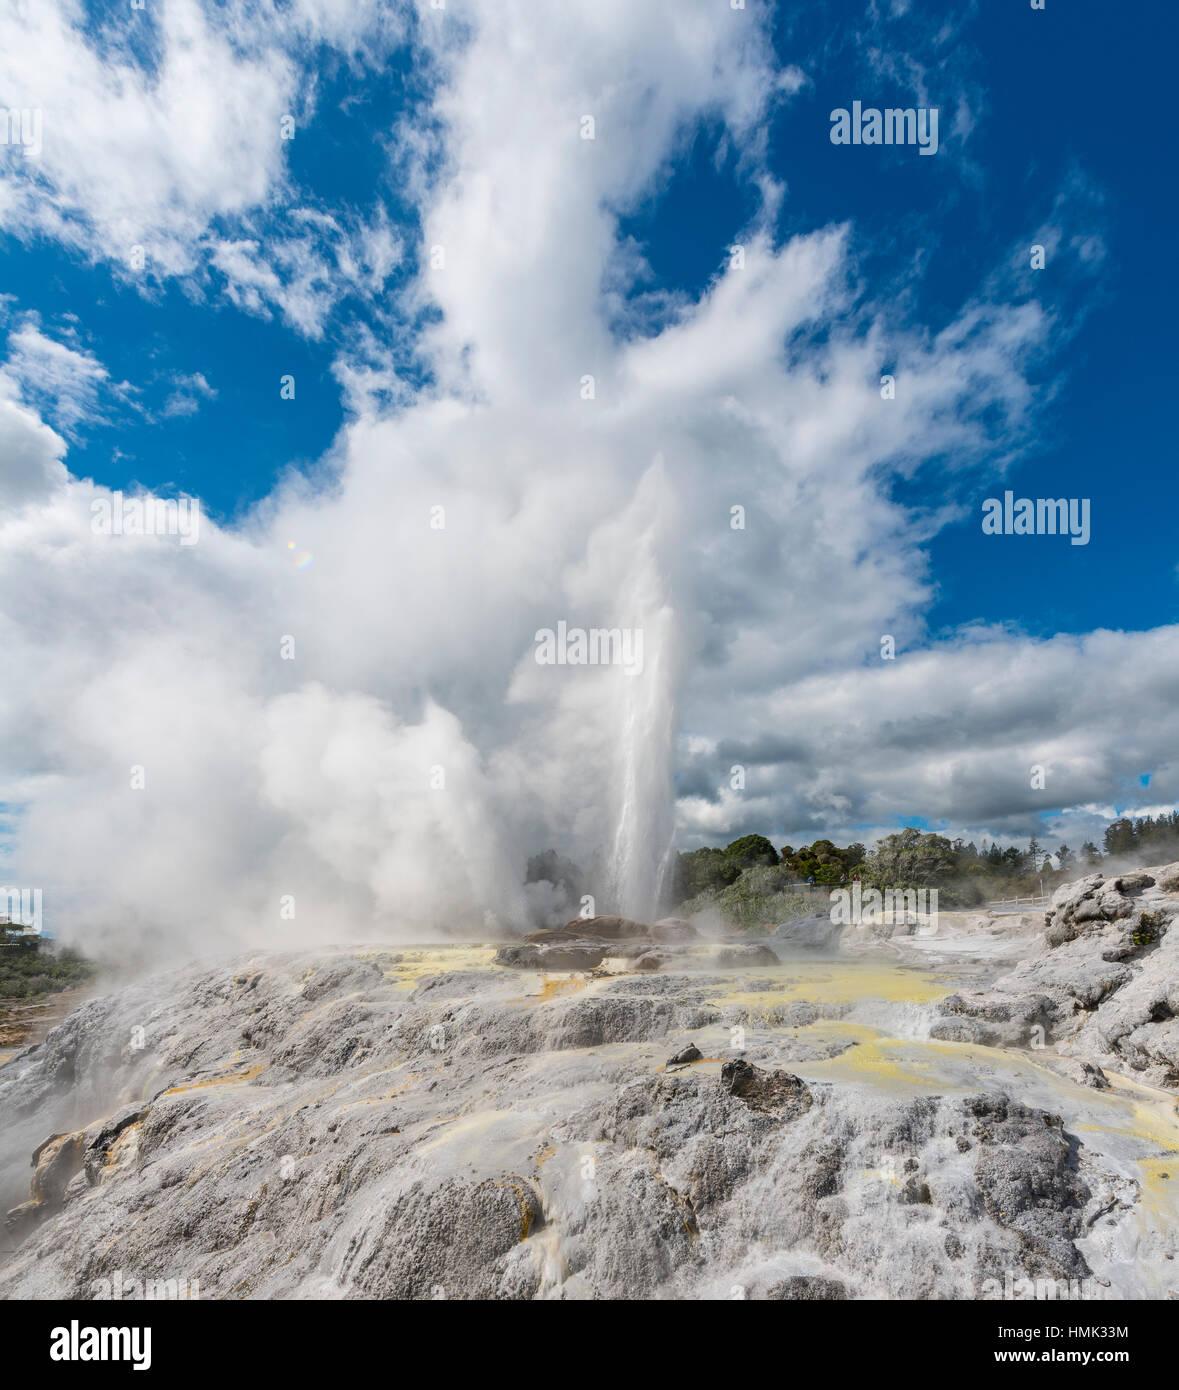 Wasser-Brunnen und Dampf, Te Puia, Whakarewarewa, Pohutu Geysir und Prince Of Wales Federn Geysir, Rotorua, Neuseeland Stockbild